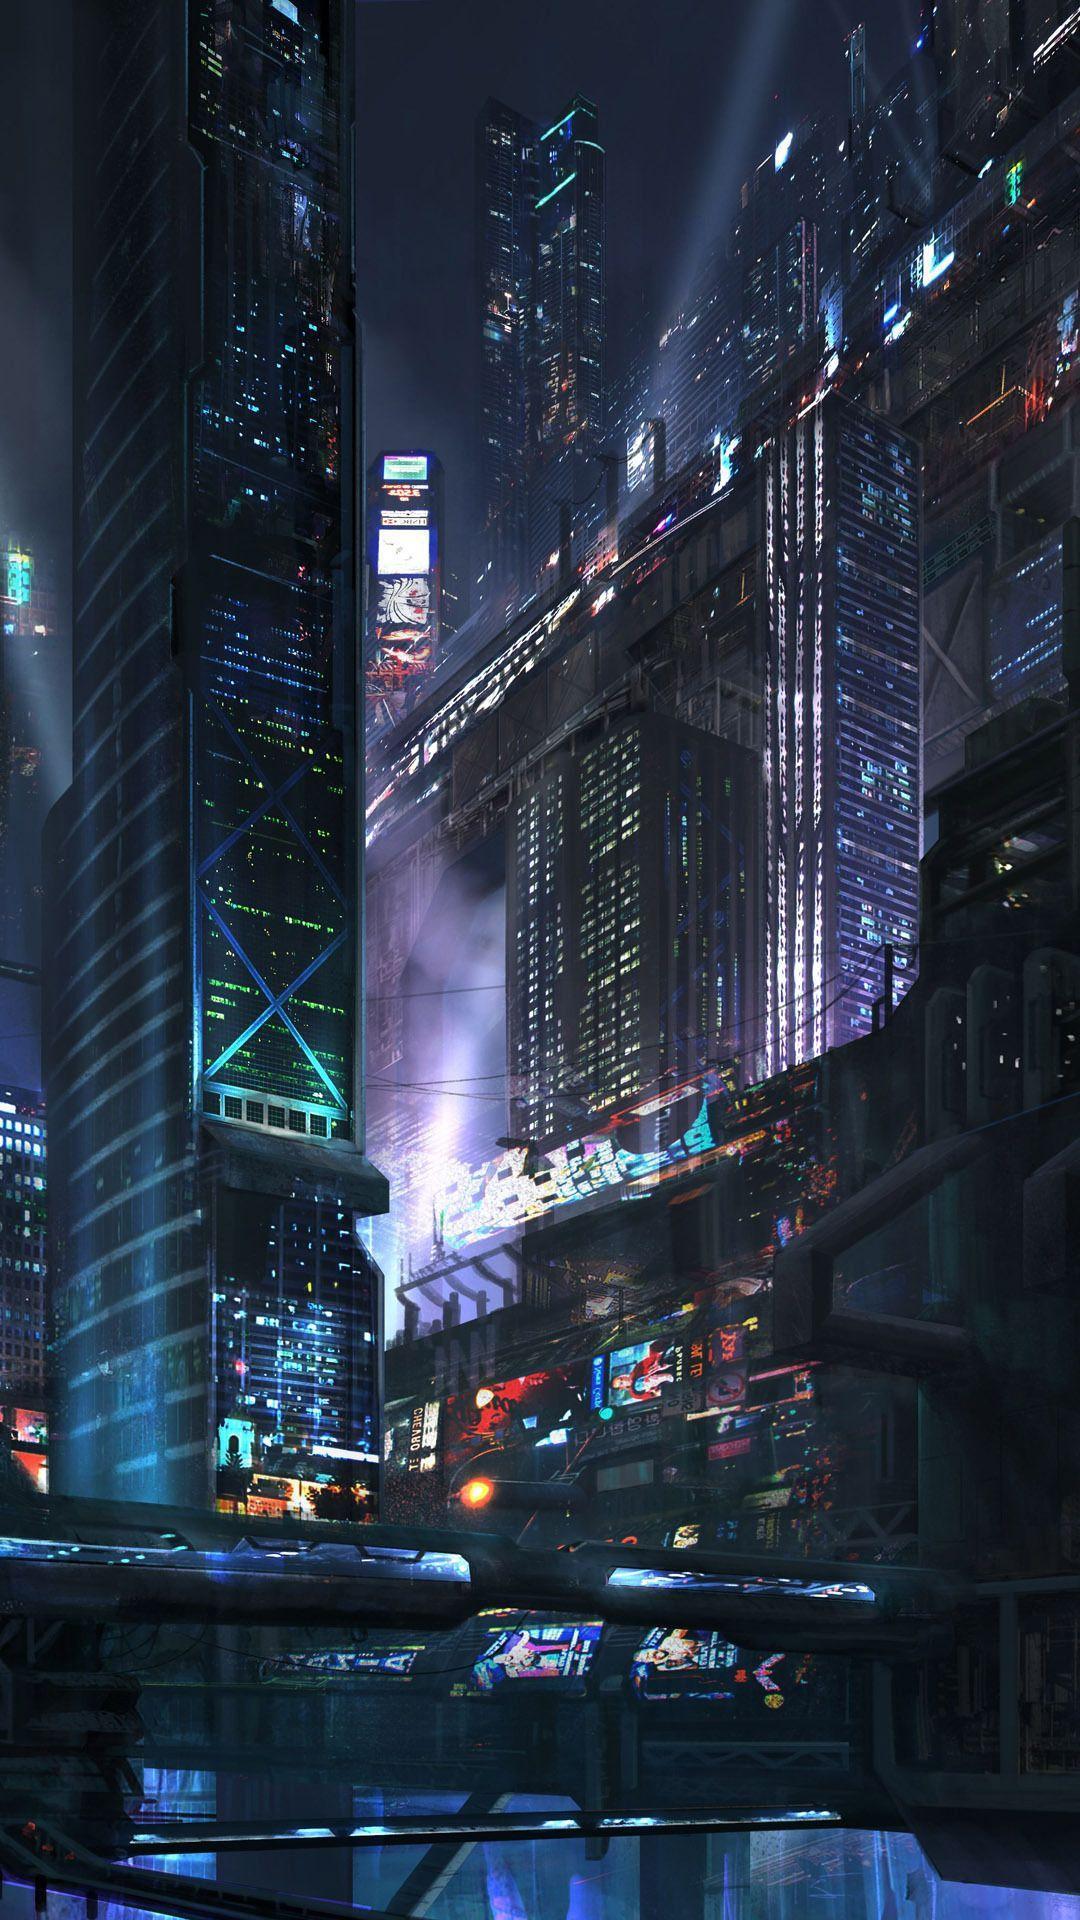 Cyberpunk 2077 Mobile HD Wallpapers - Wallpaper Cave